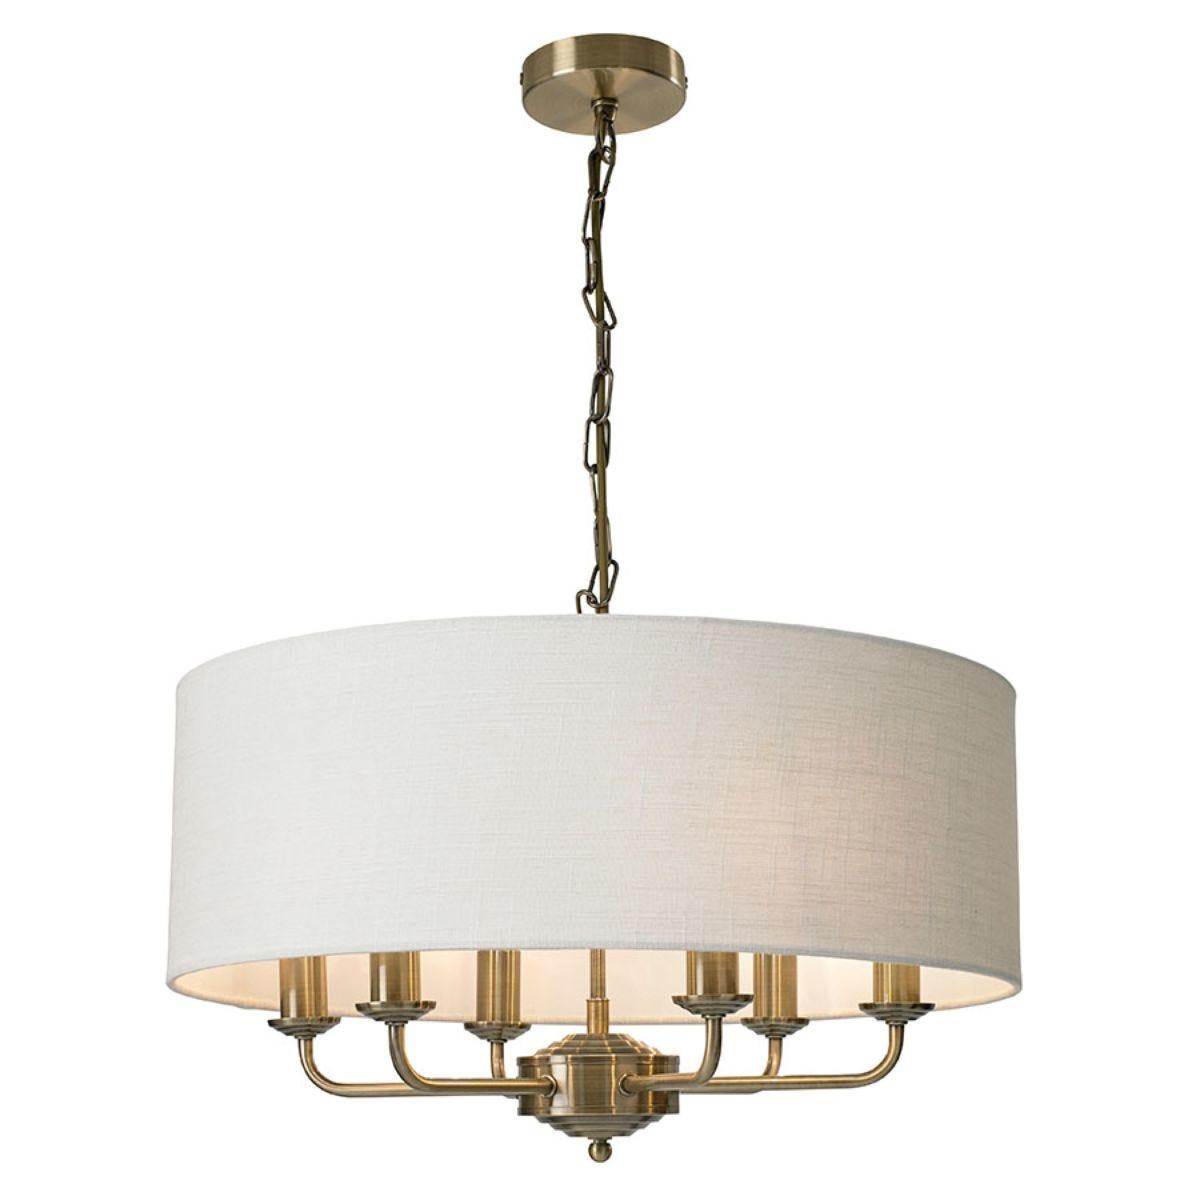 Village At Home Grantham 6-Light Ceiling Light - Brass